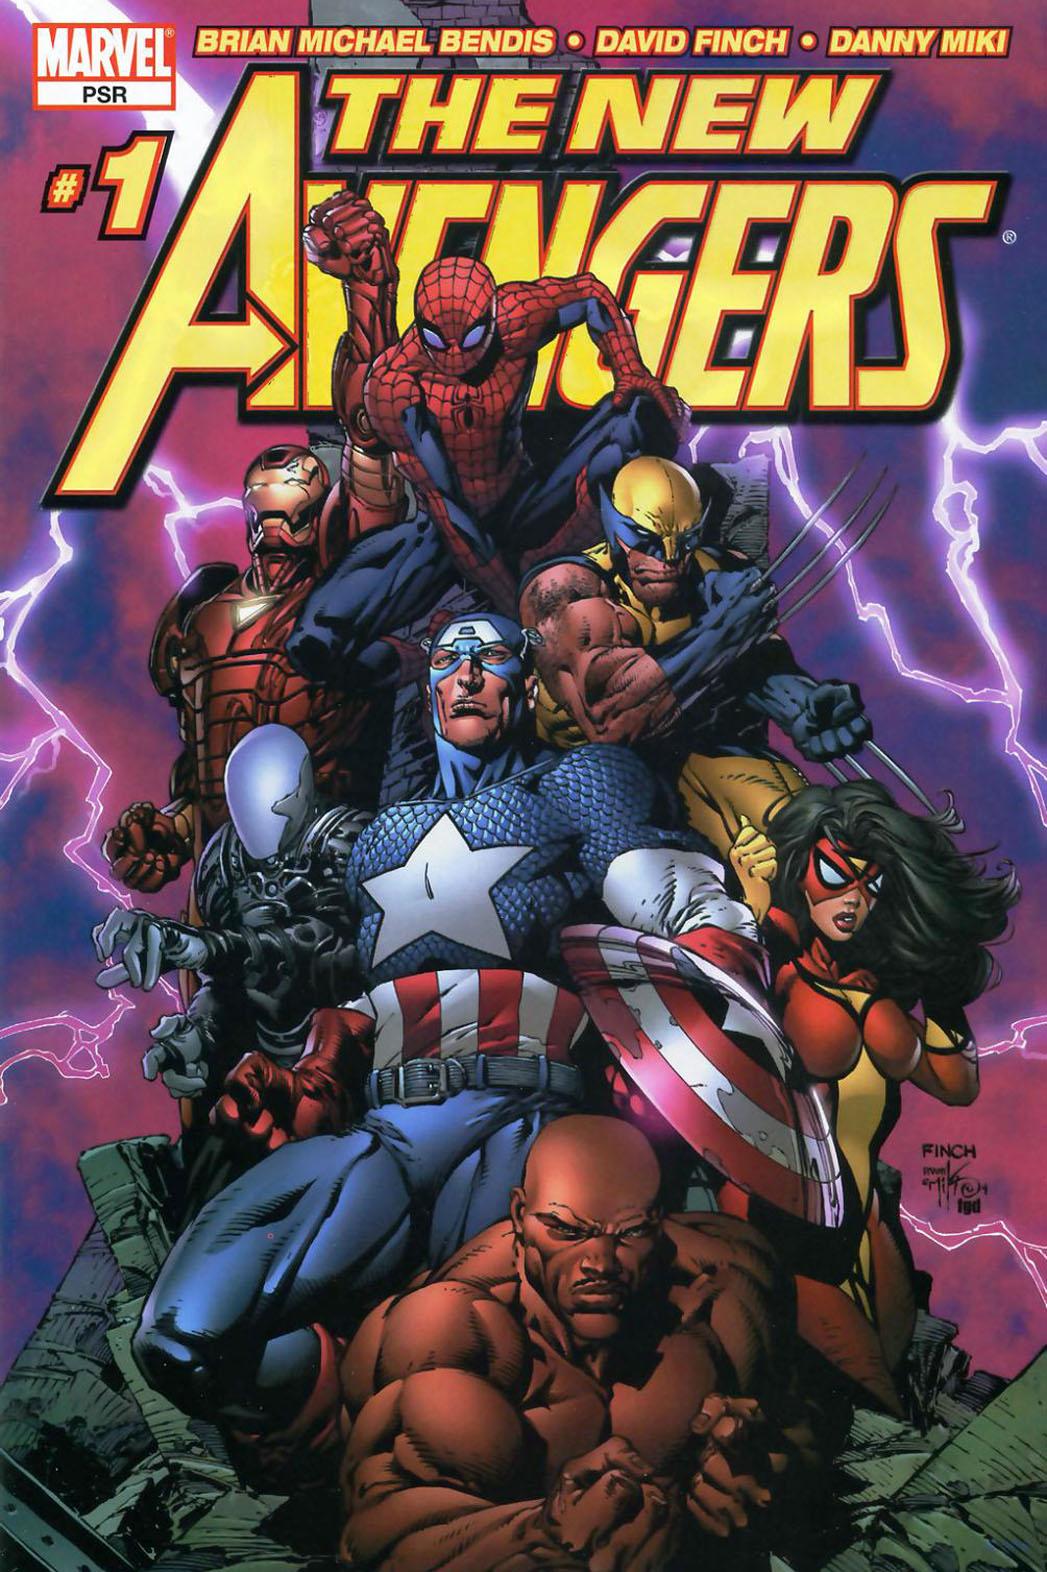 The Avengers Comic Art - P 2013